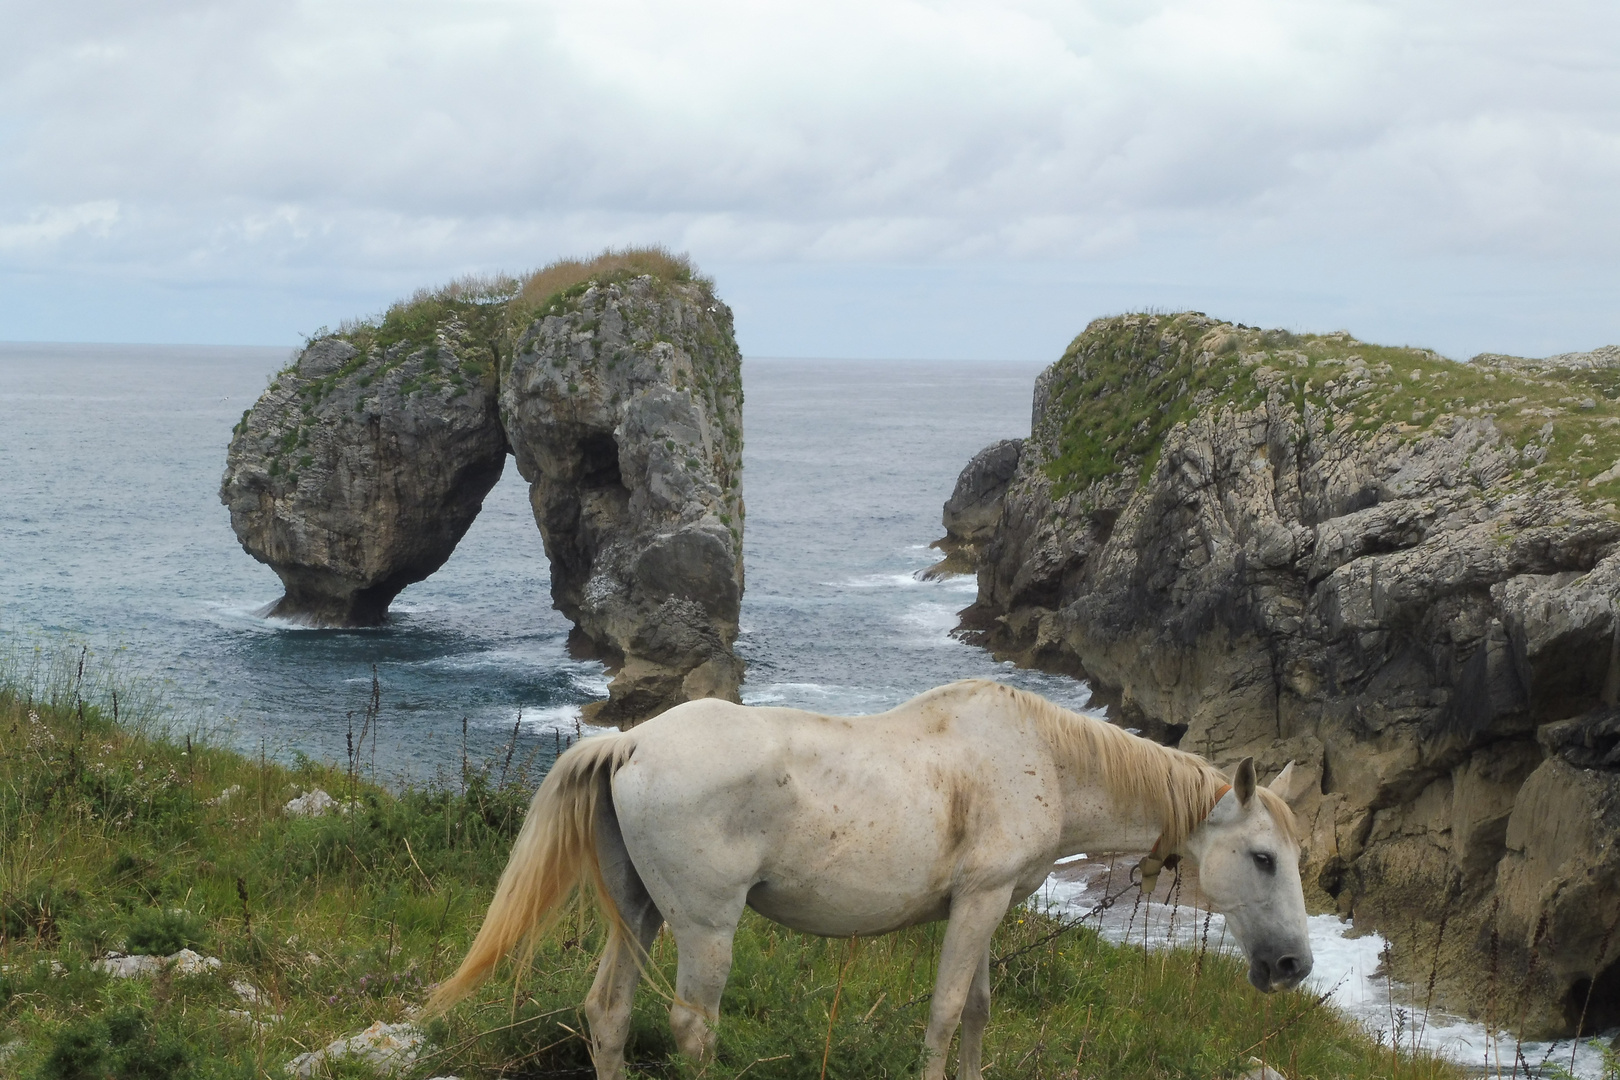 In Asturien am Meer